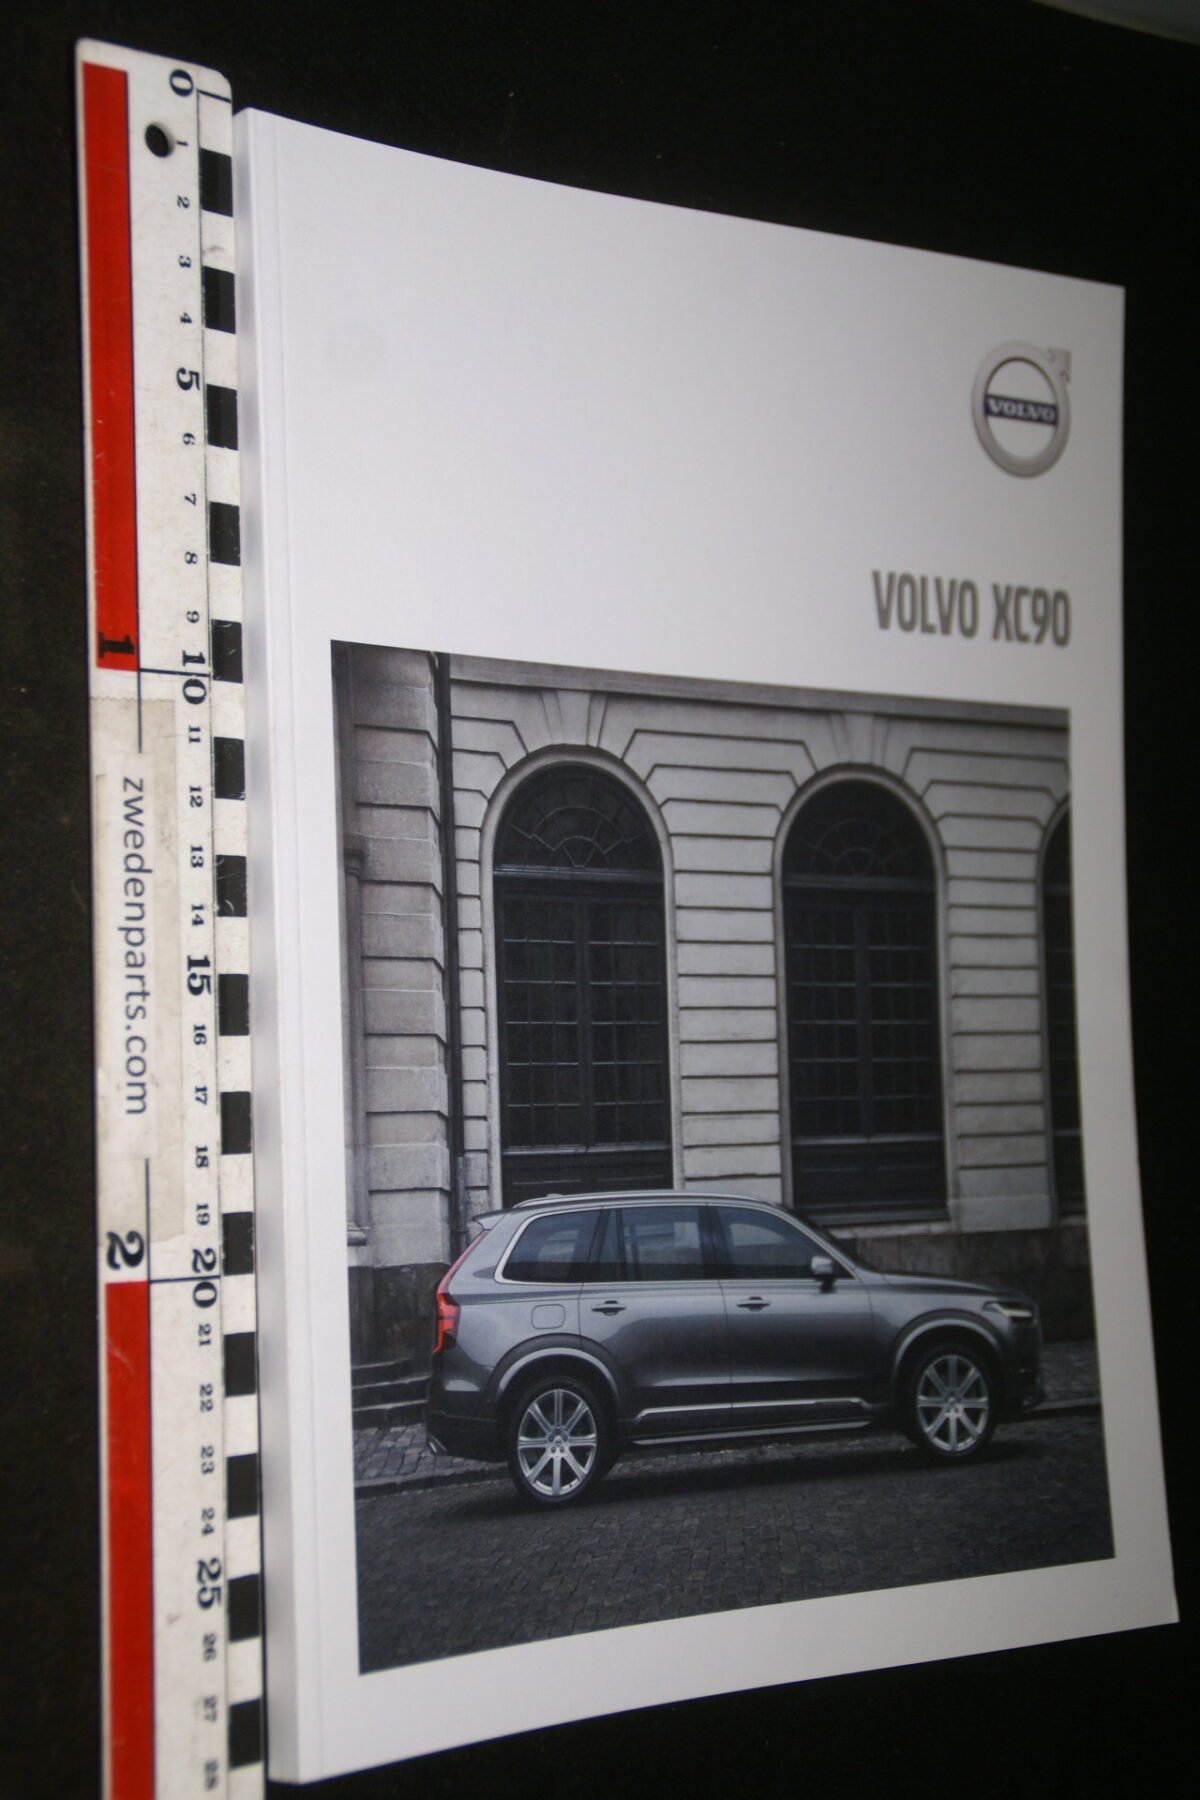 DSC04450 2014 brochure Volvo XC90 nr. MY 18 5-2017-V1-4da71014